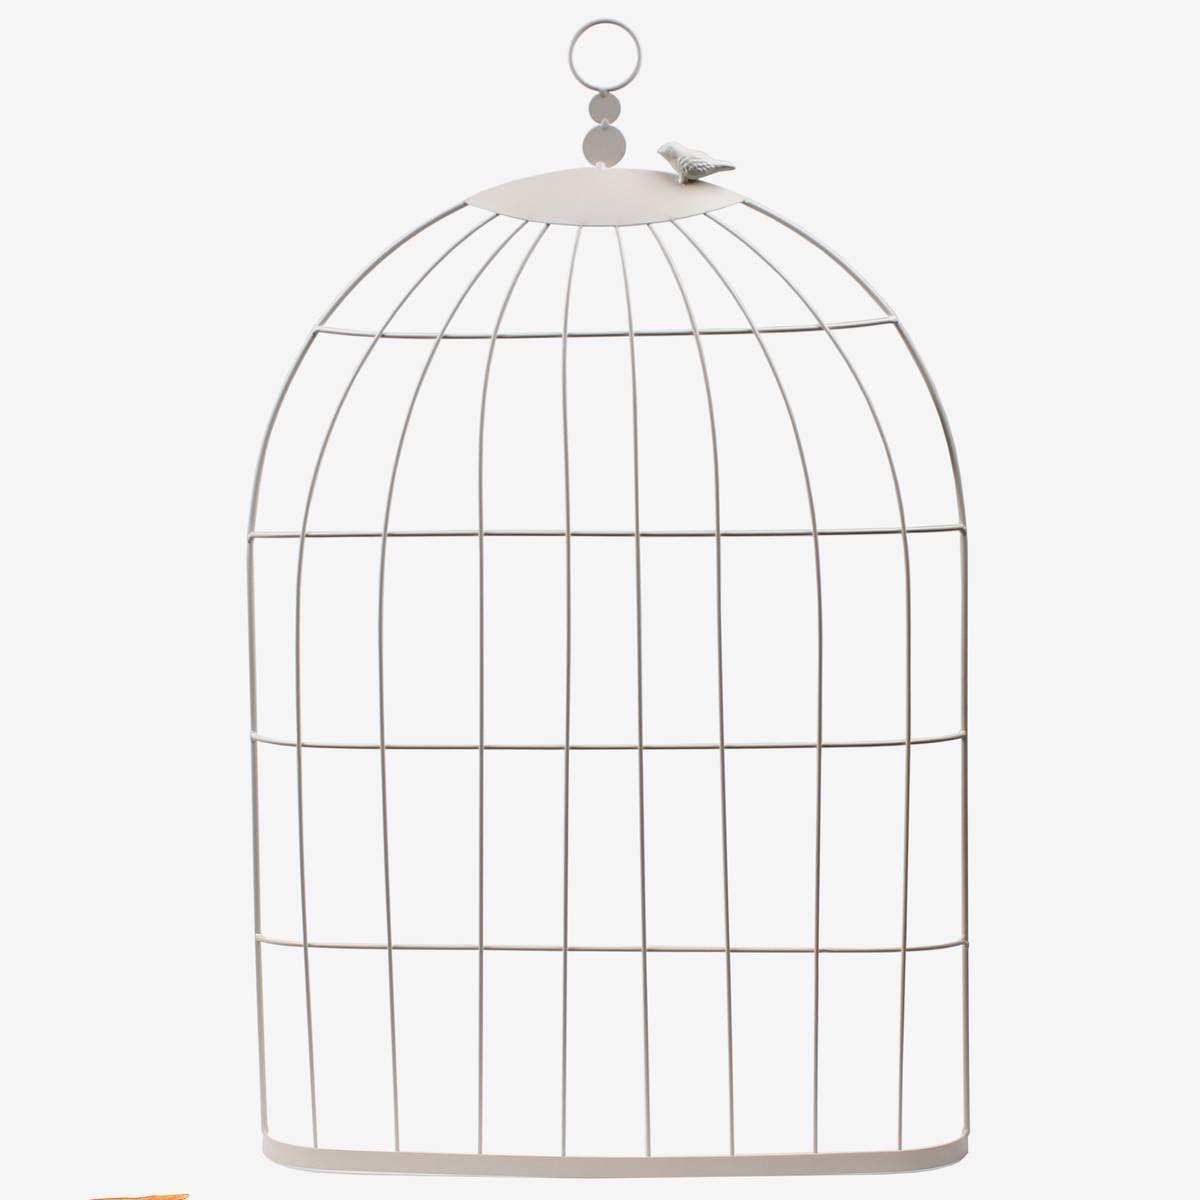 Birdcage Table Plan Stand 80 Cm Hobbycraft Wedding Wedding